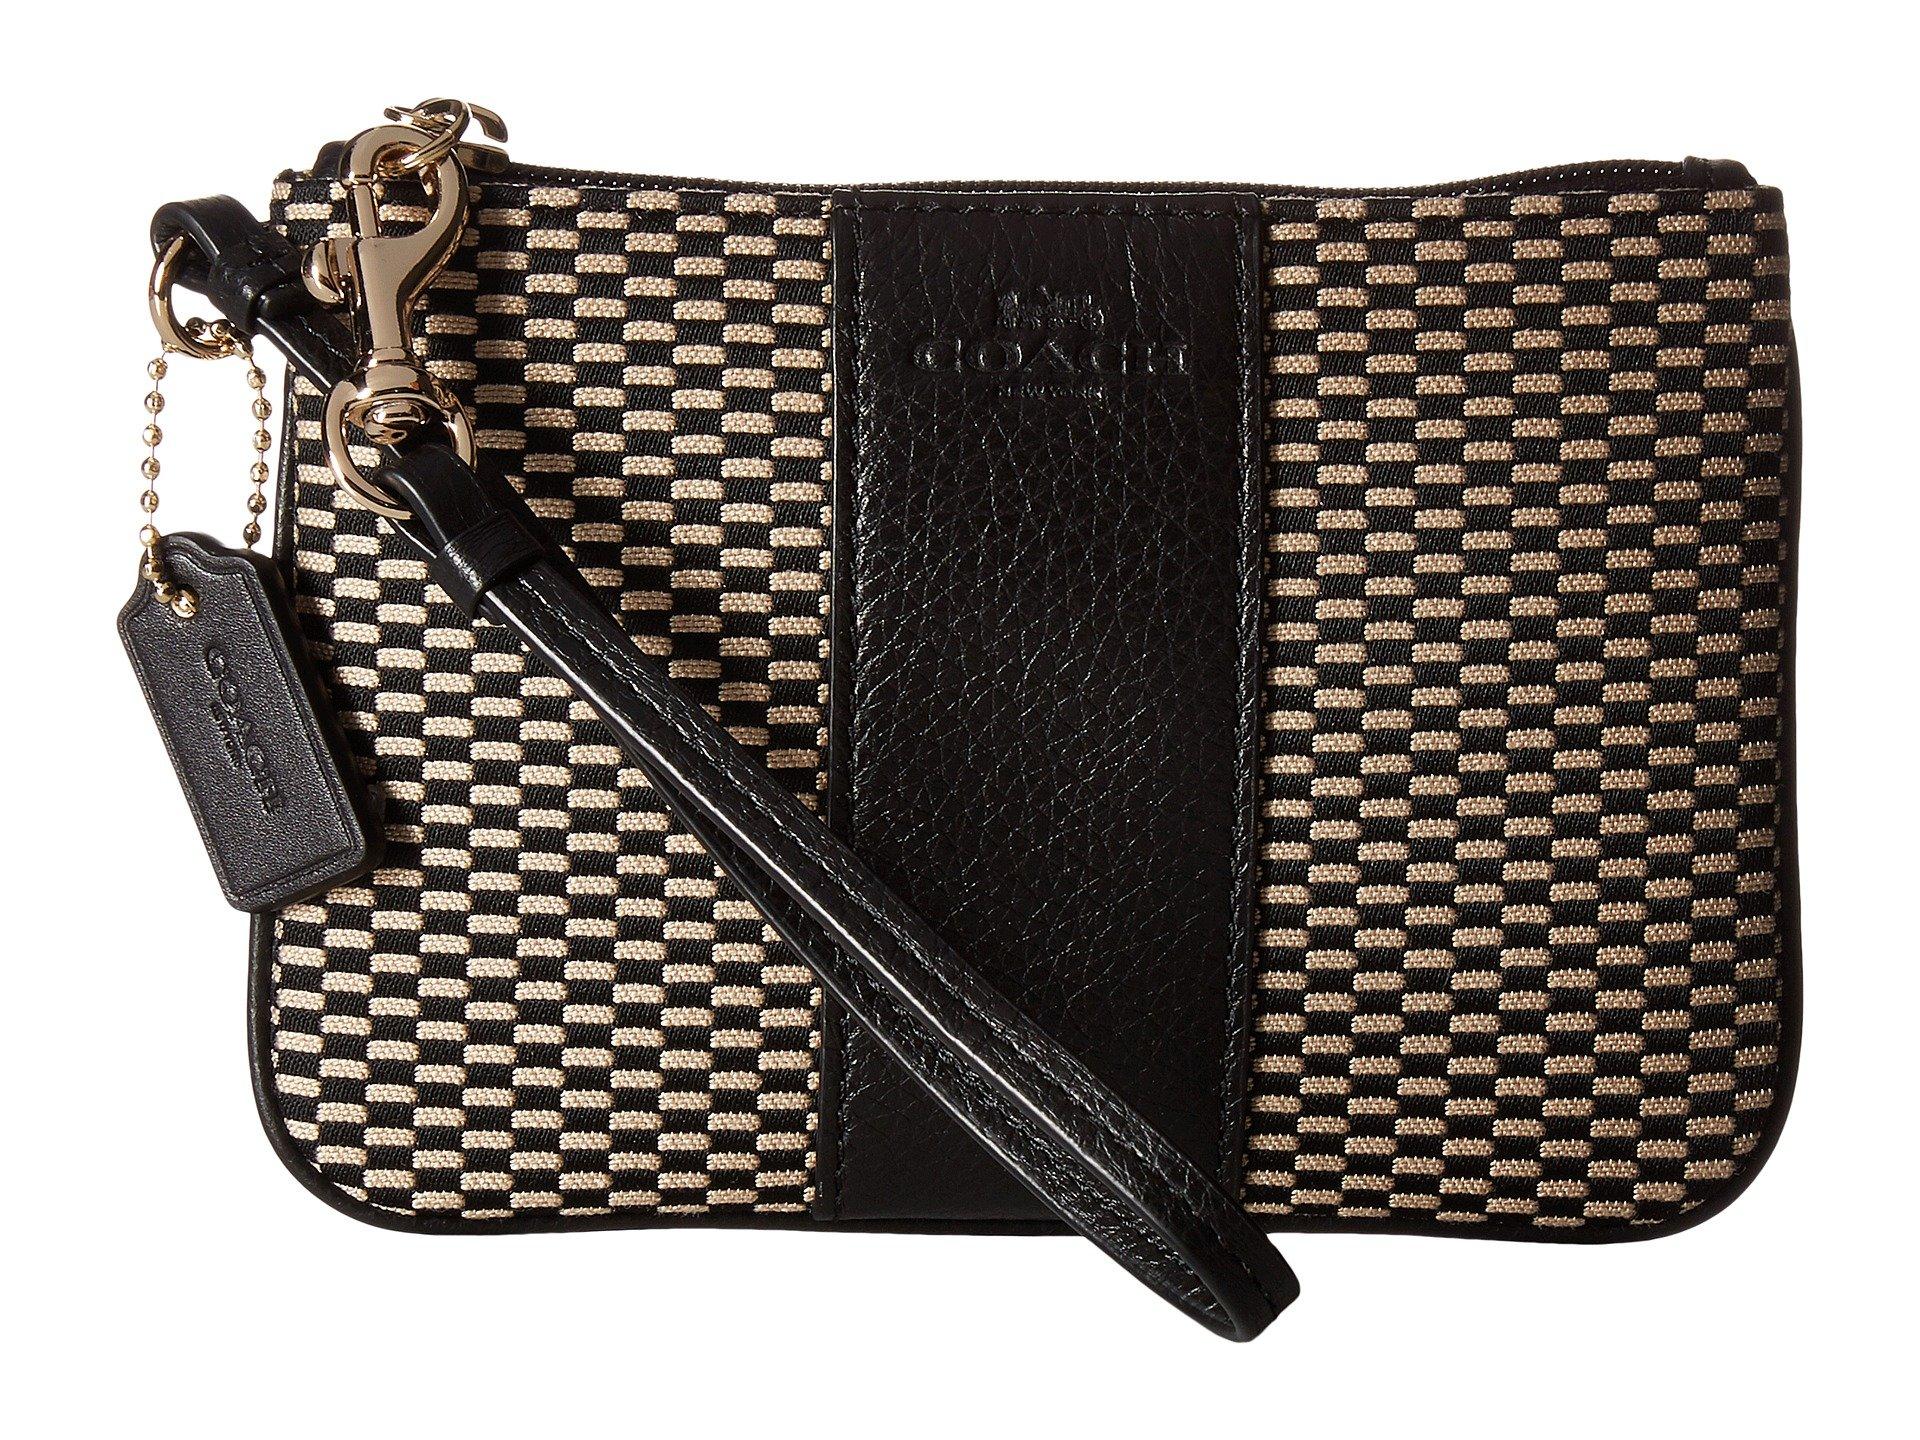 56% OFF COACH Exploded Rep Small Wristlet Handbag for $29.99 @ 6pm